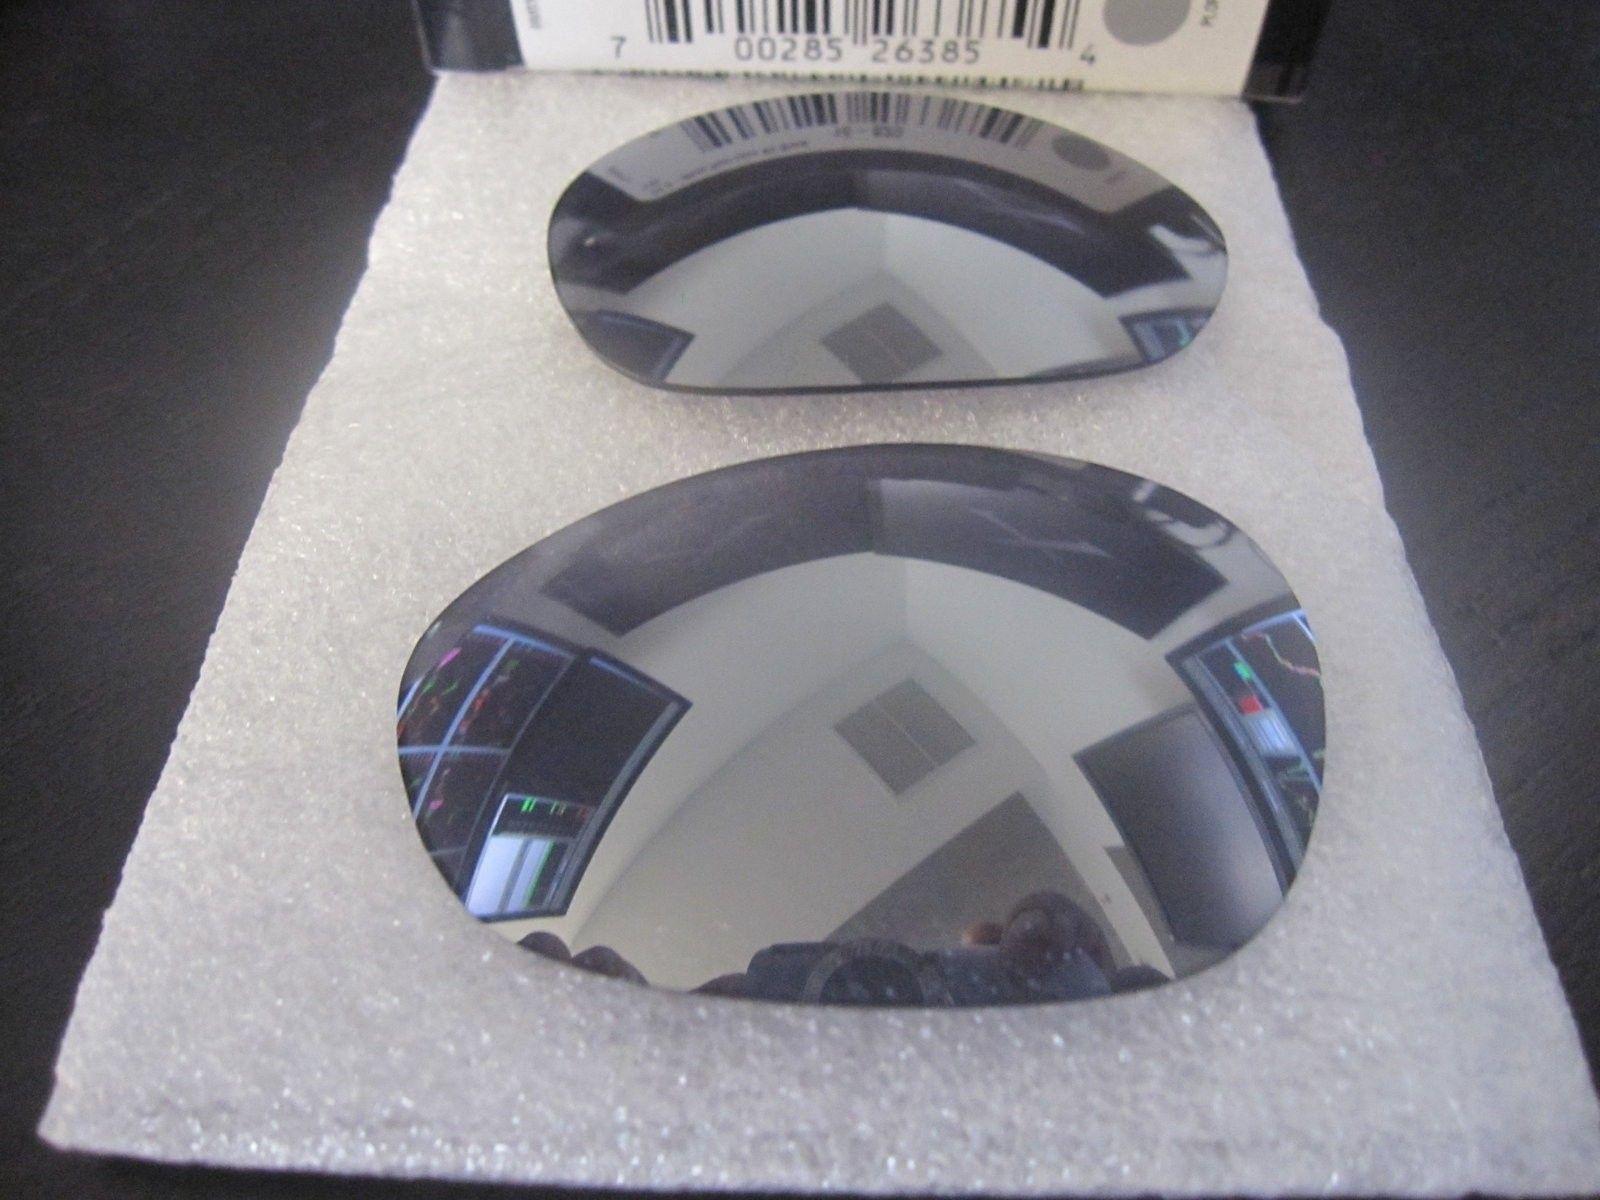 BNIB XX OEM BI Lenses - SKU 16-820 - GONE - IMG_5439.JPG